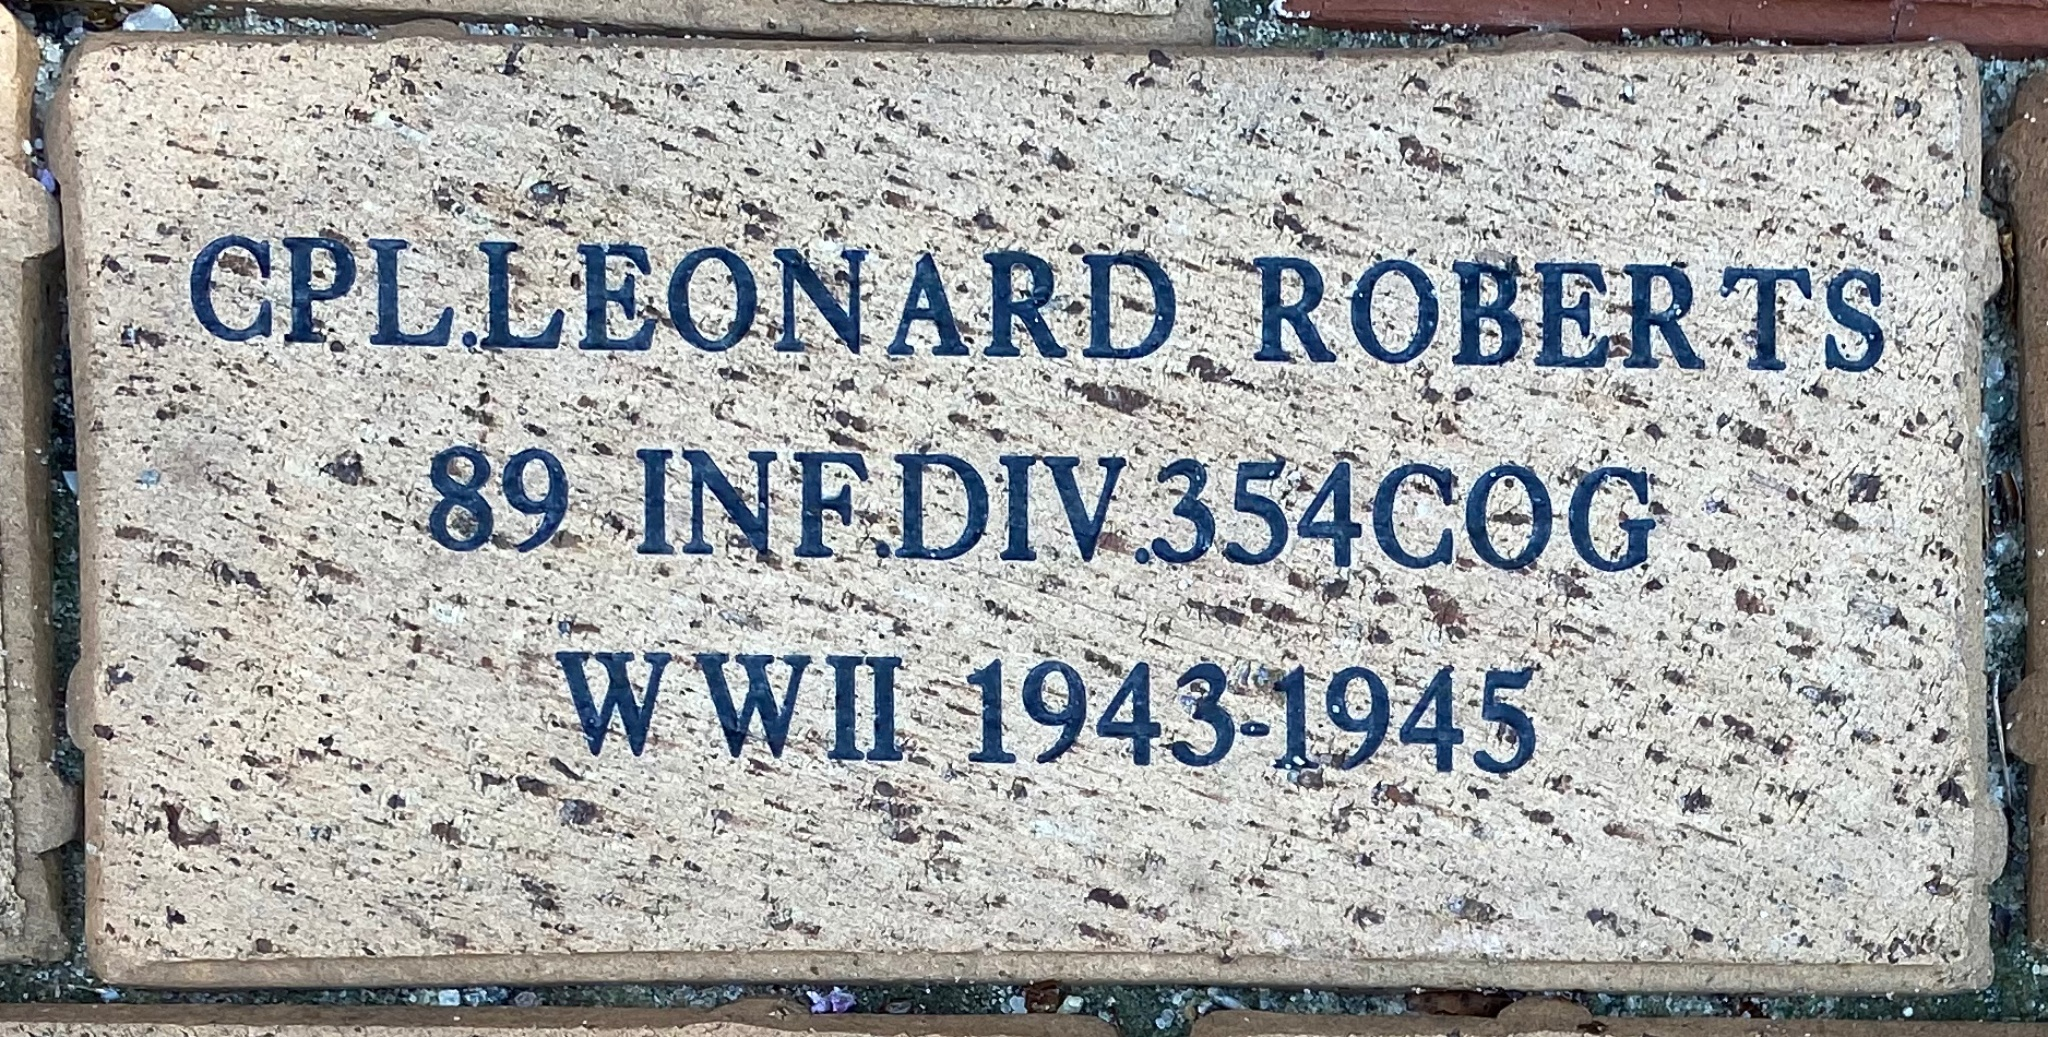 CPL LEONARD ROBERTS 89 INF.DIV 354COG WWII 1943-1945